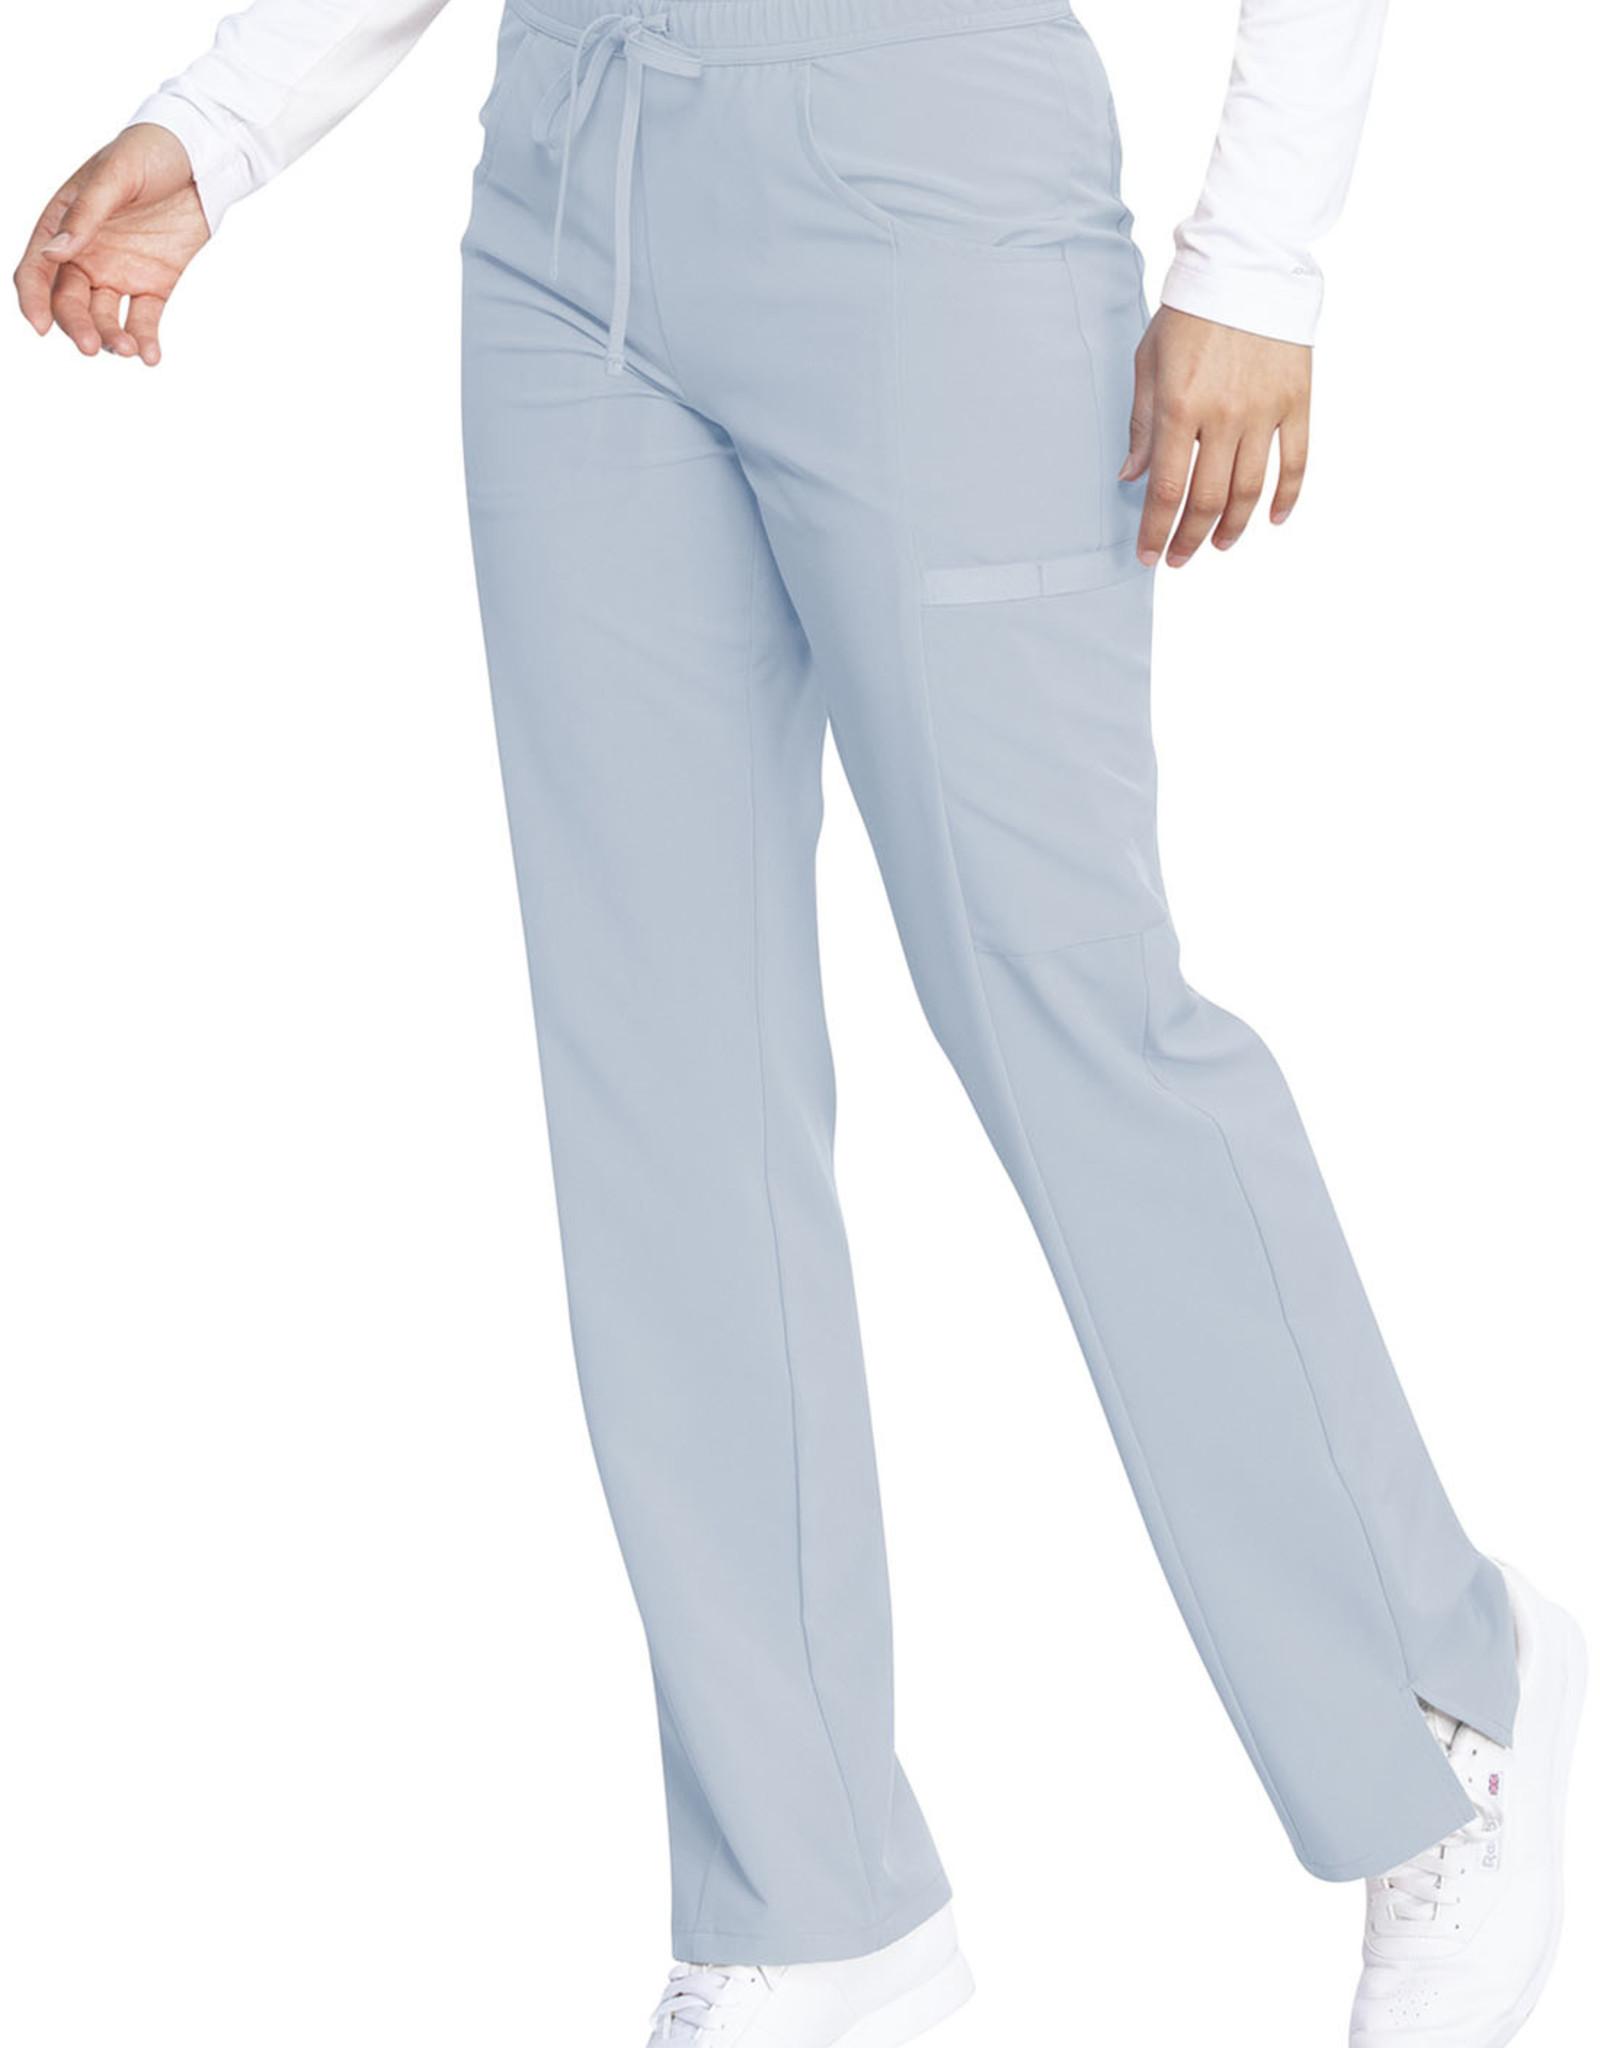 Mid Rise Straight Leg Drawstring Pant - Dickies EDS Pant DK010